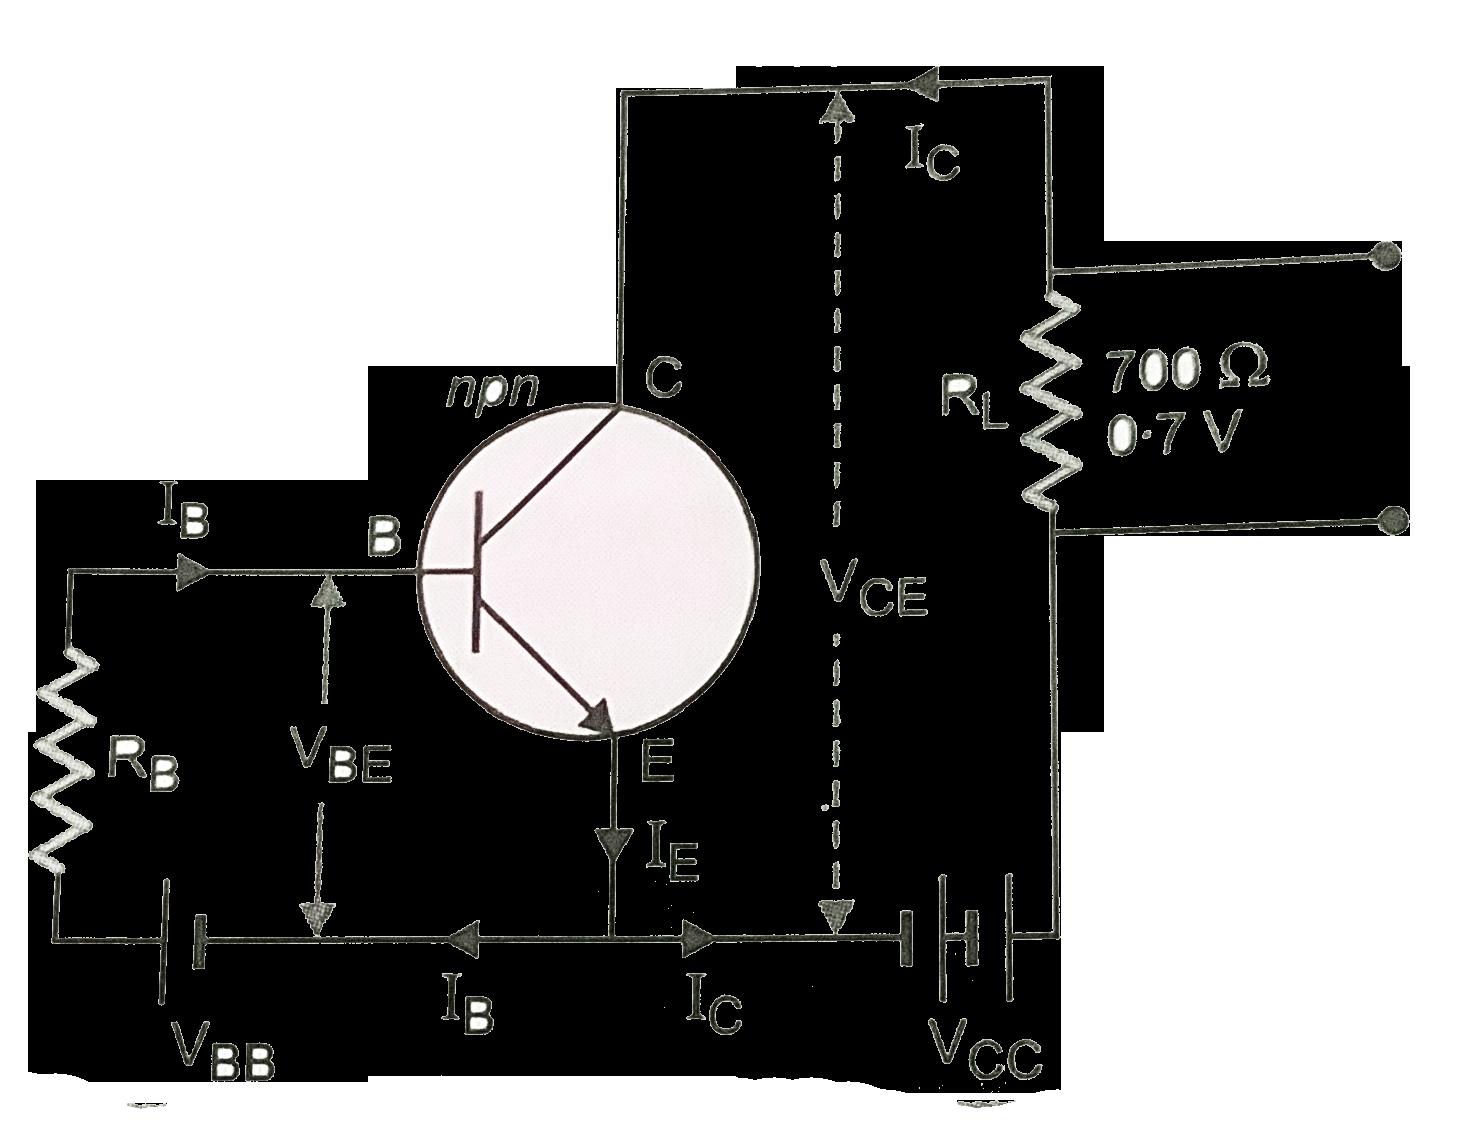 Basic Common Emitter Amplifier Circuit